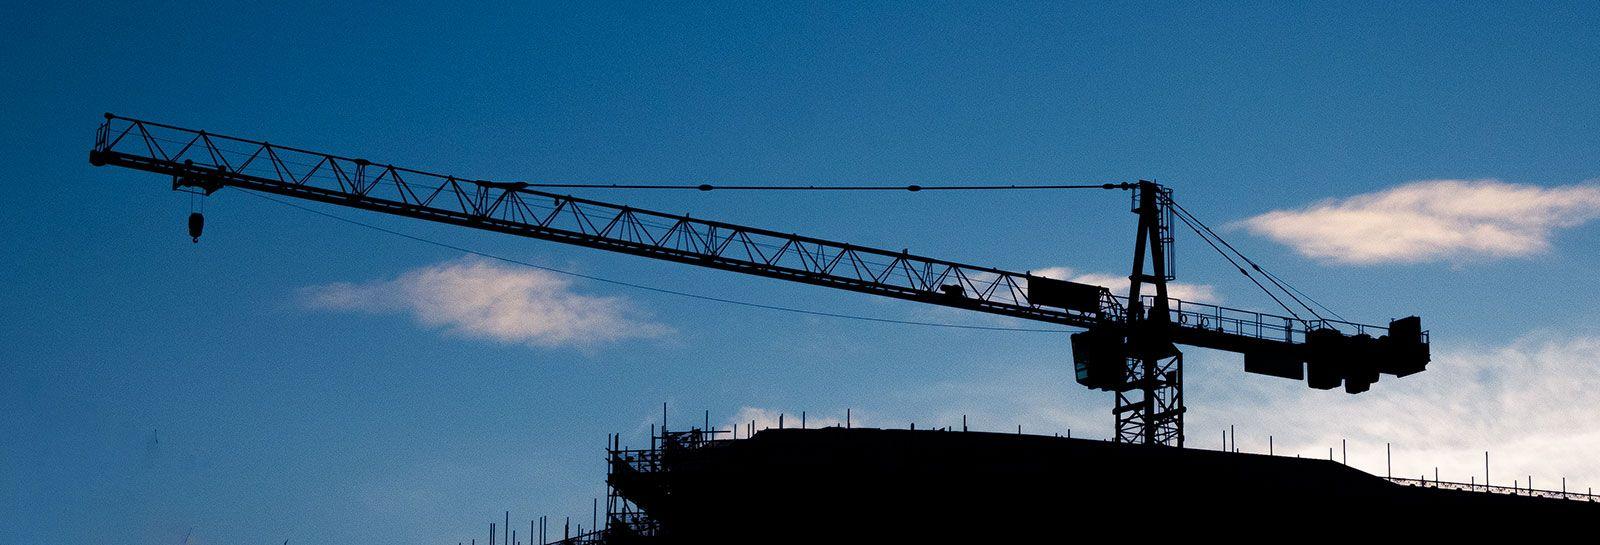 crane banner image